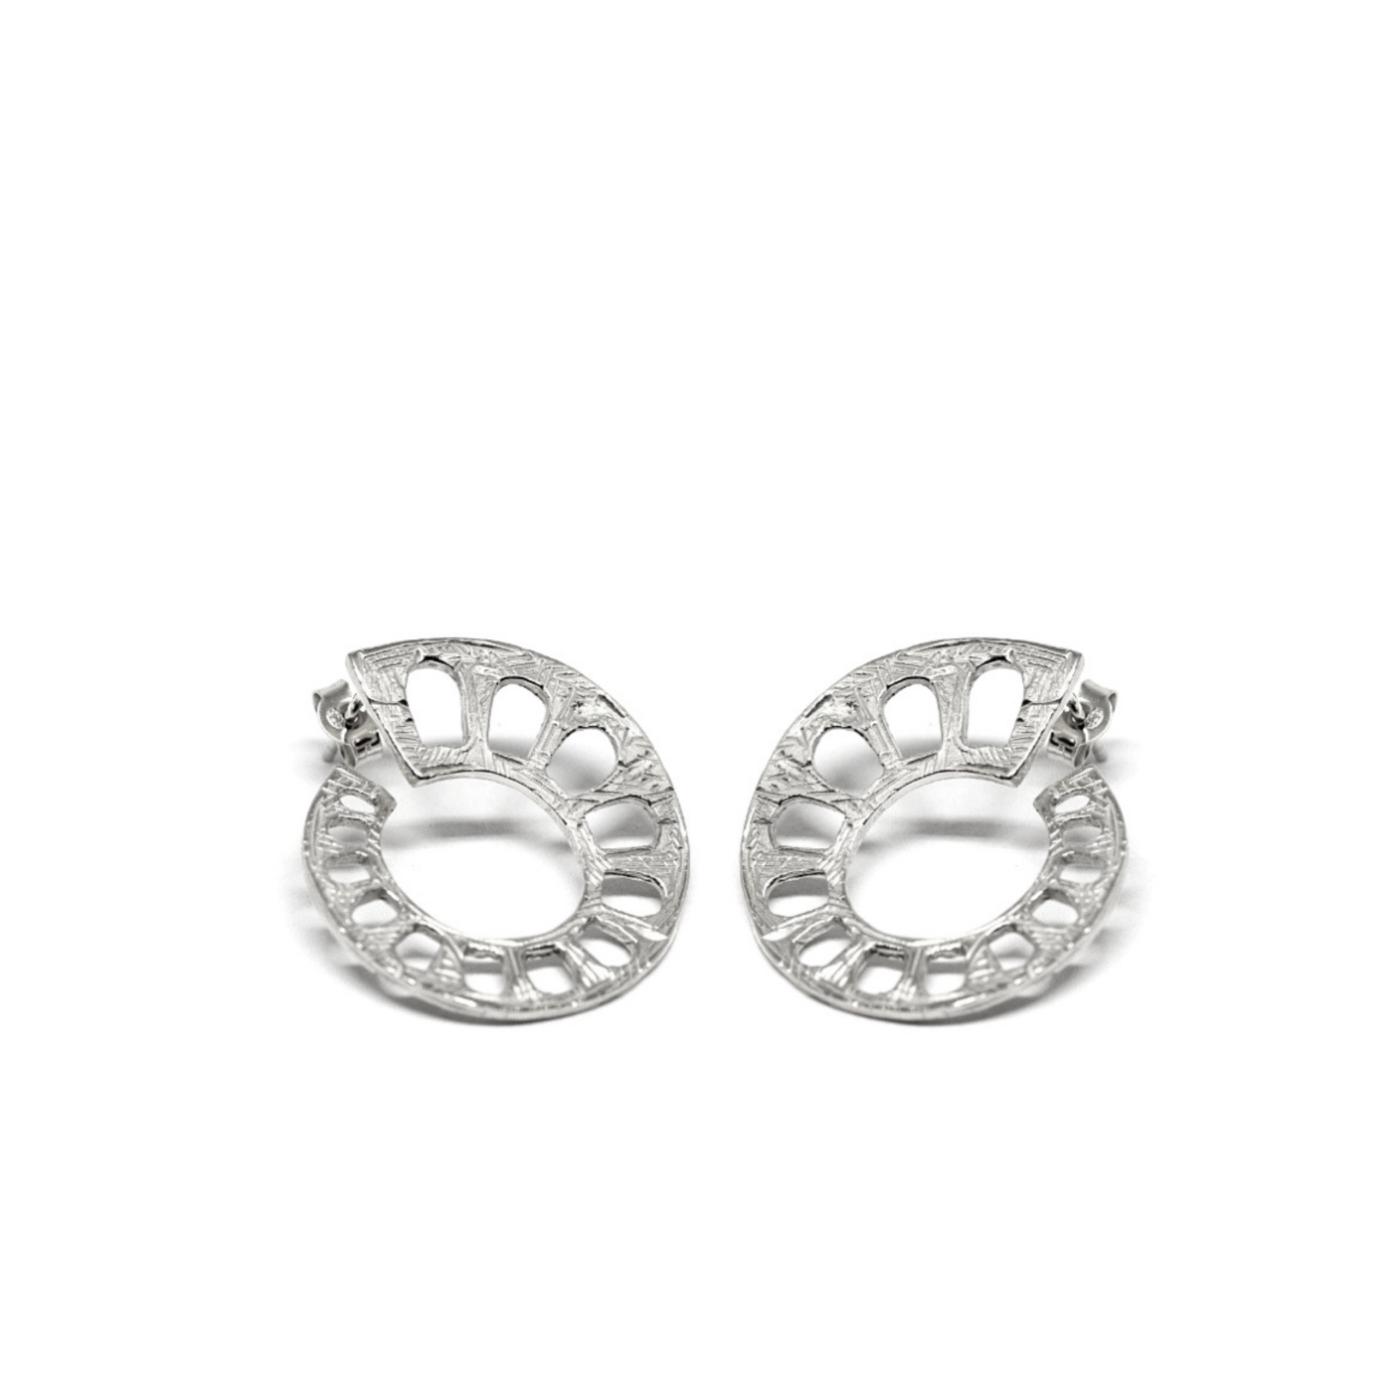 Aqueduct Earrings 925 Sterling Silver